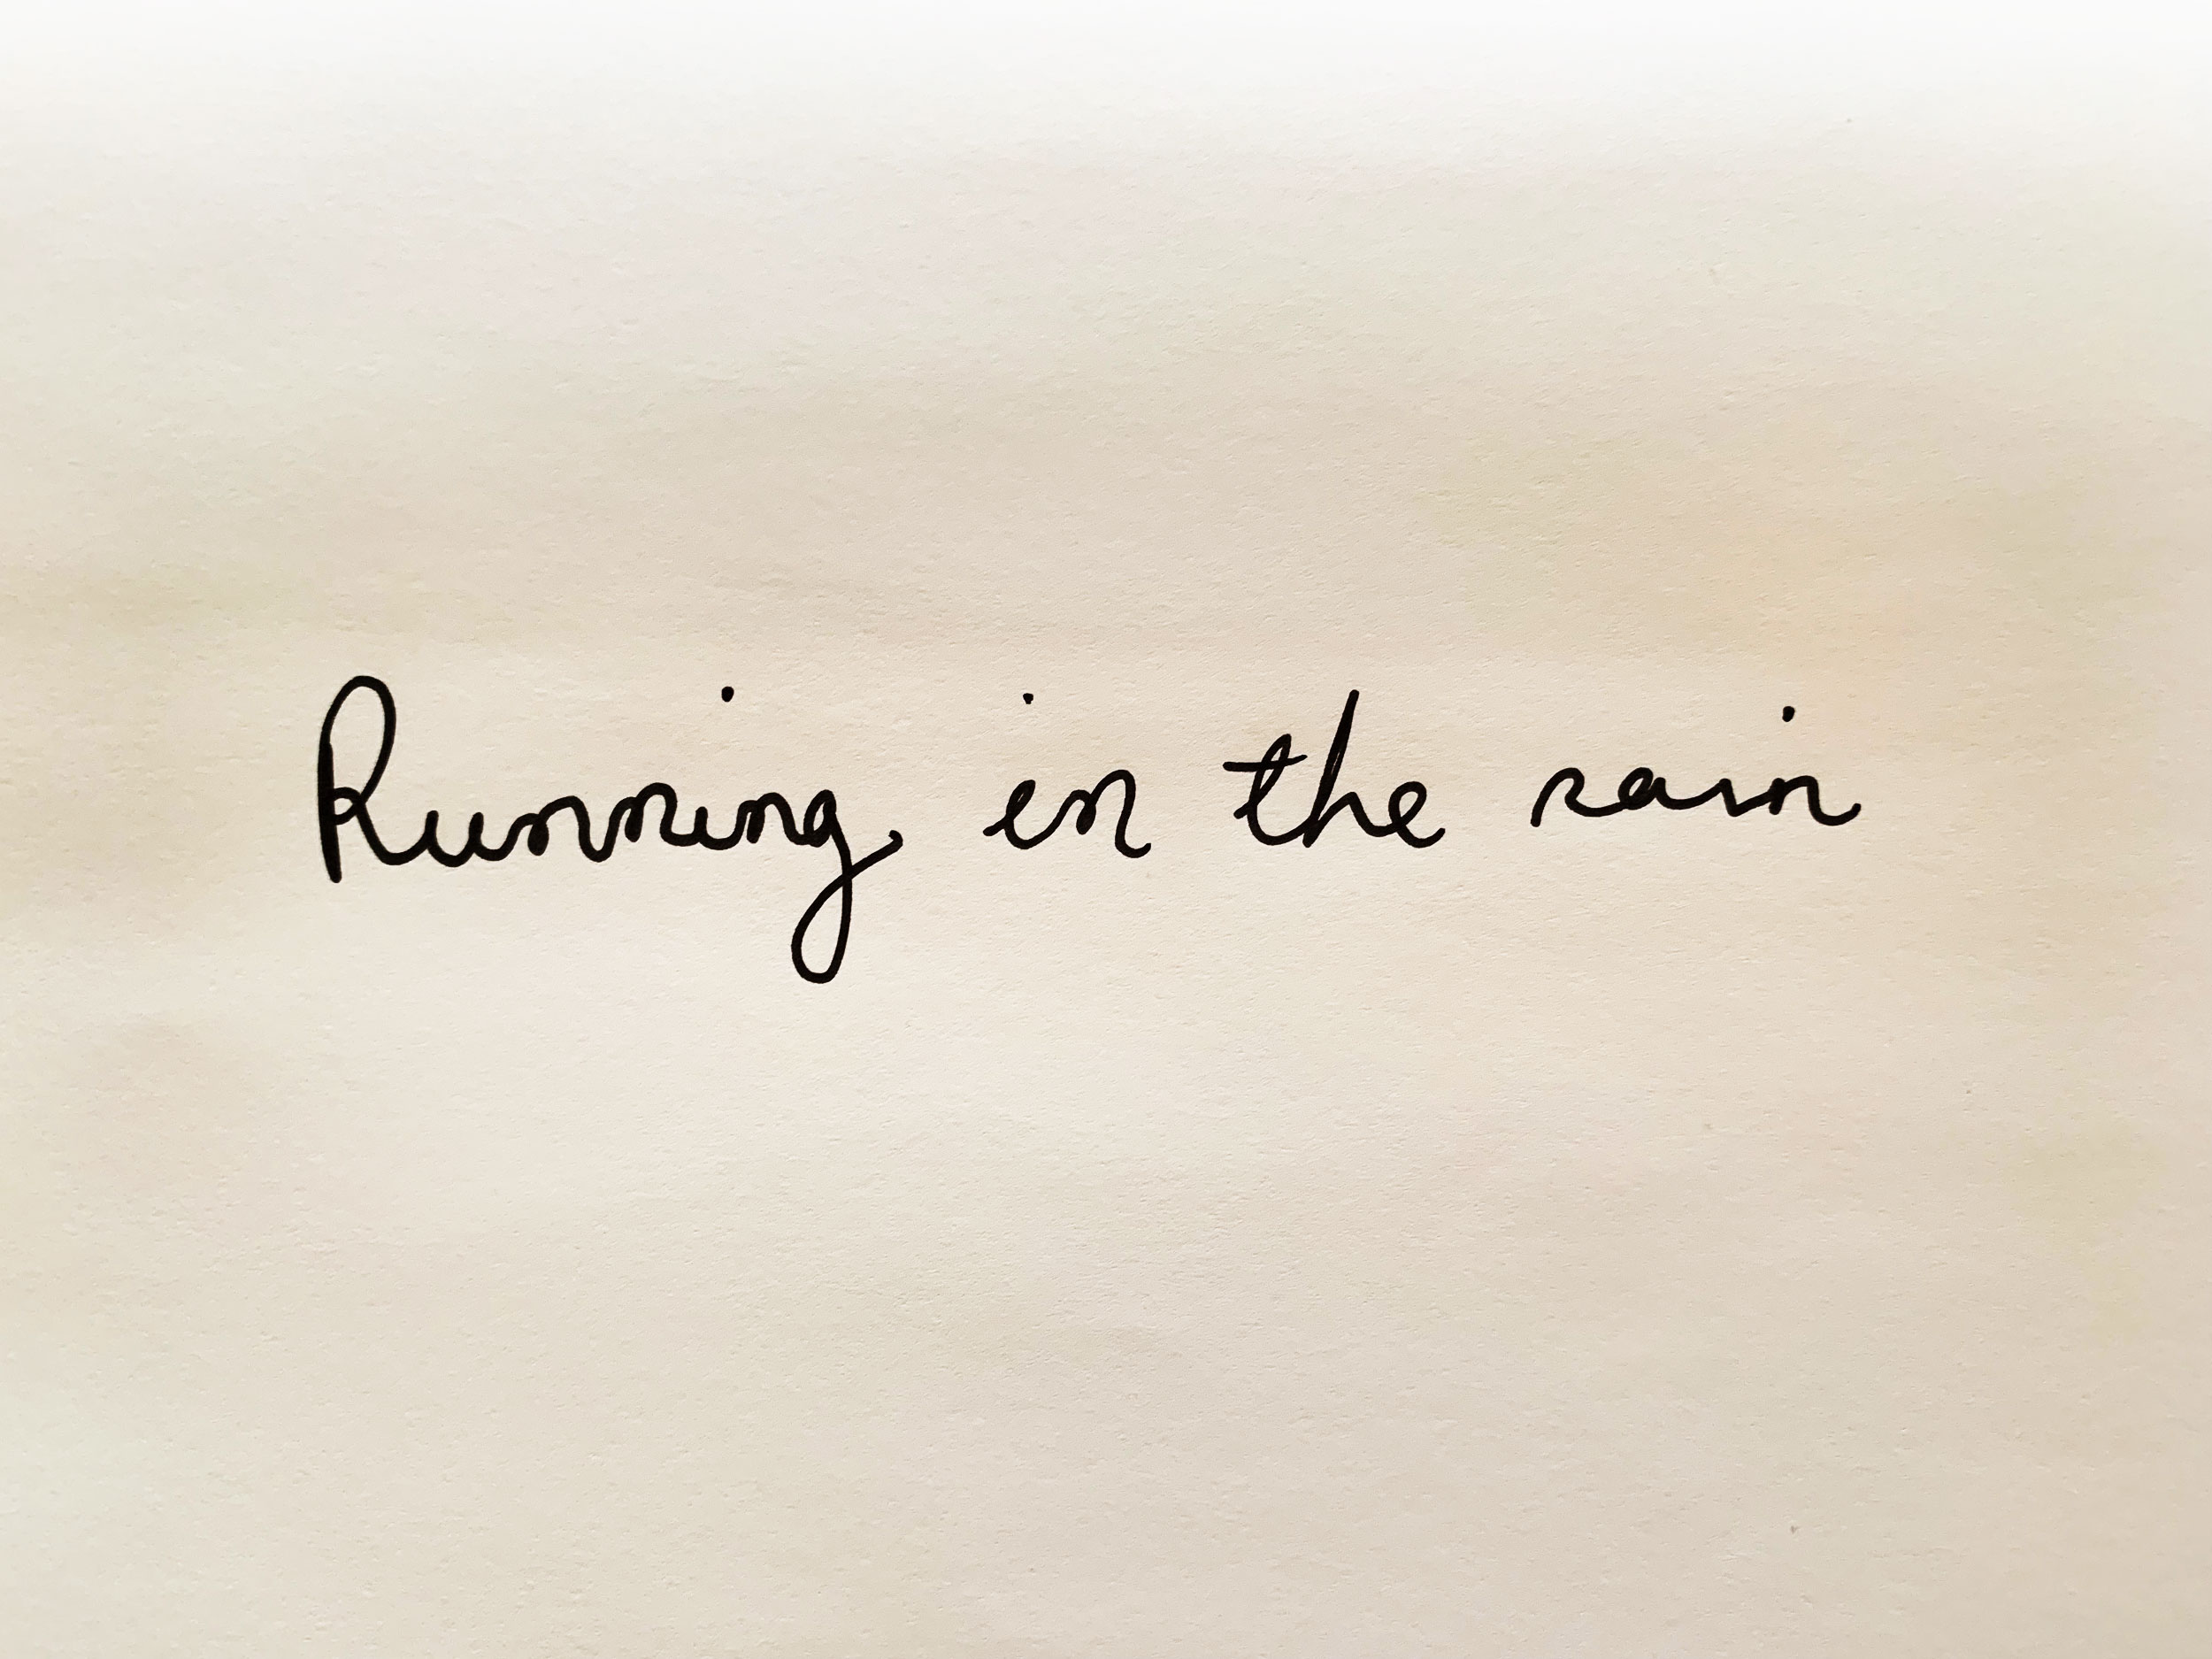 Running in the rain. Drawing Luke Hockley.